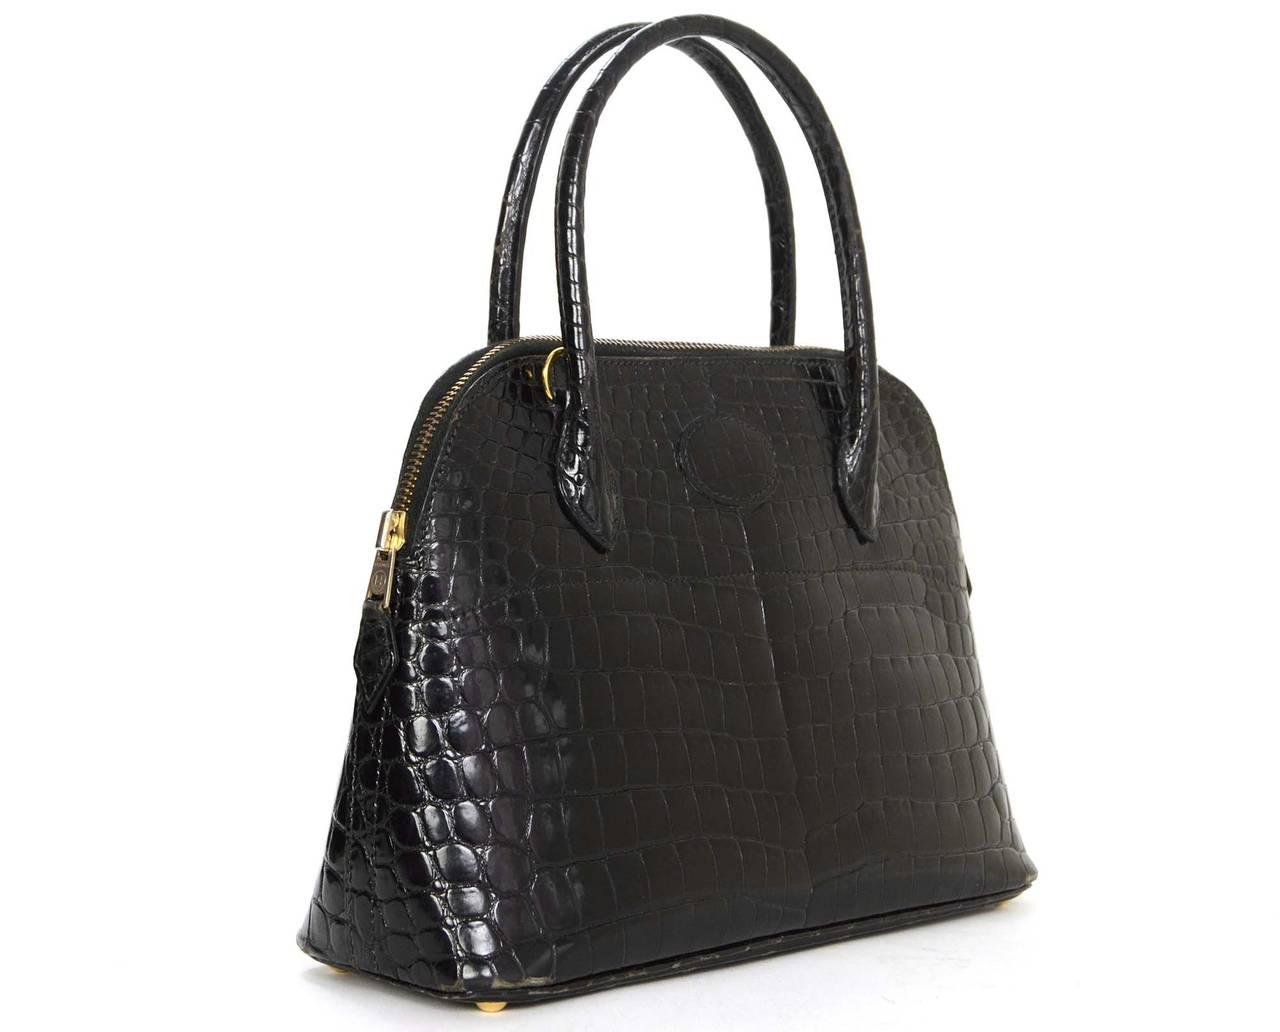 hermes bolide crocodile handbag